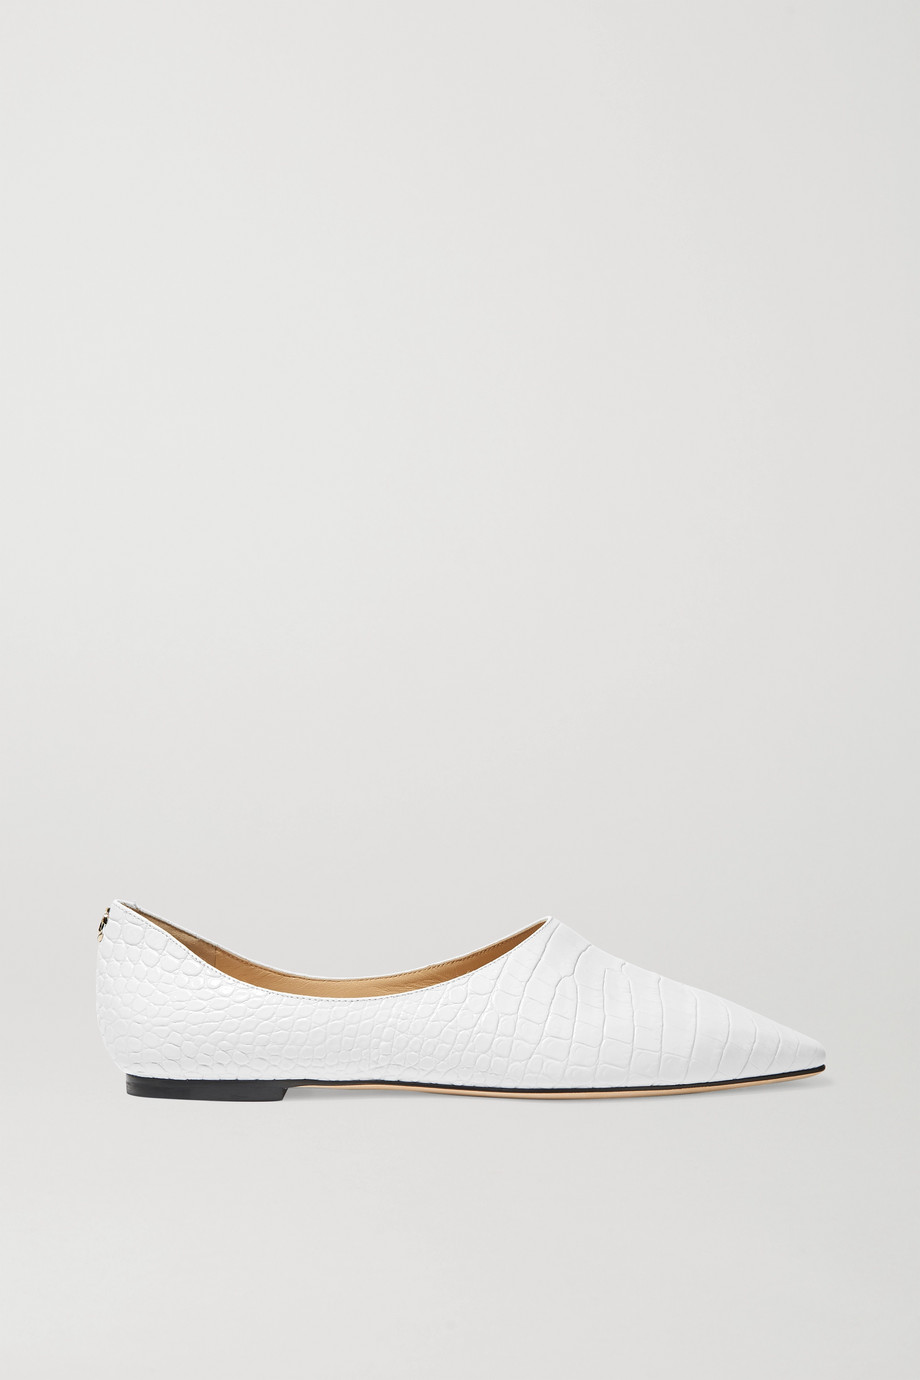 Jimmy Choo Joselyn croc-effect leather ballet flats